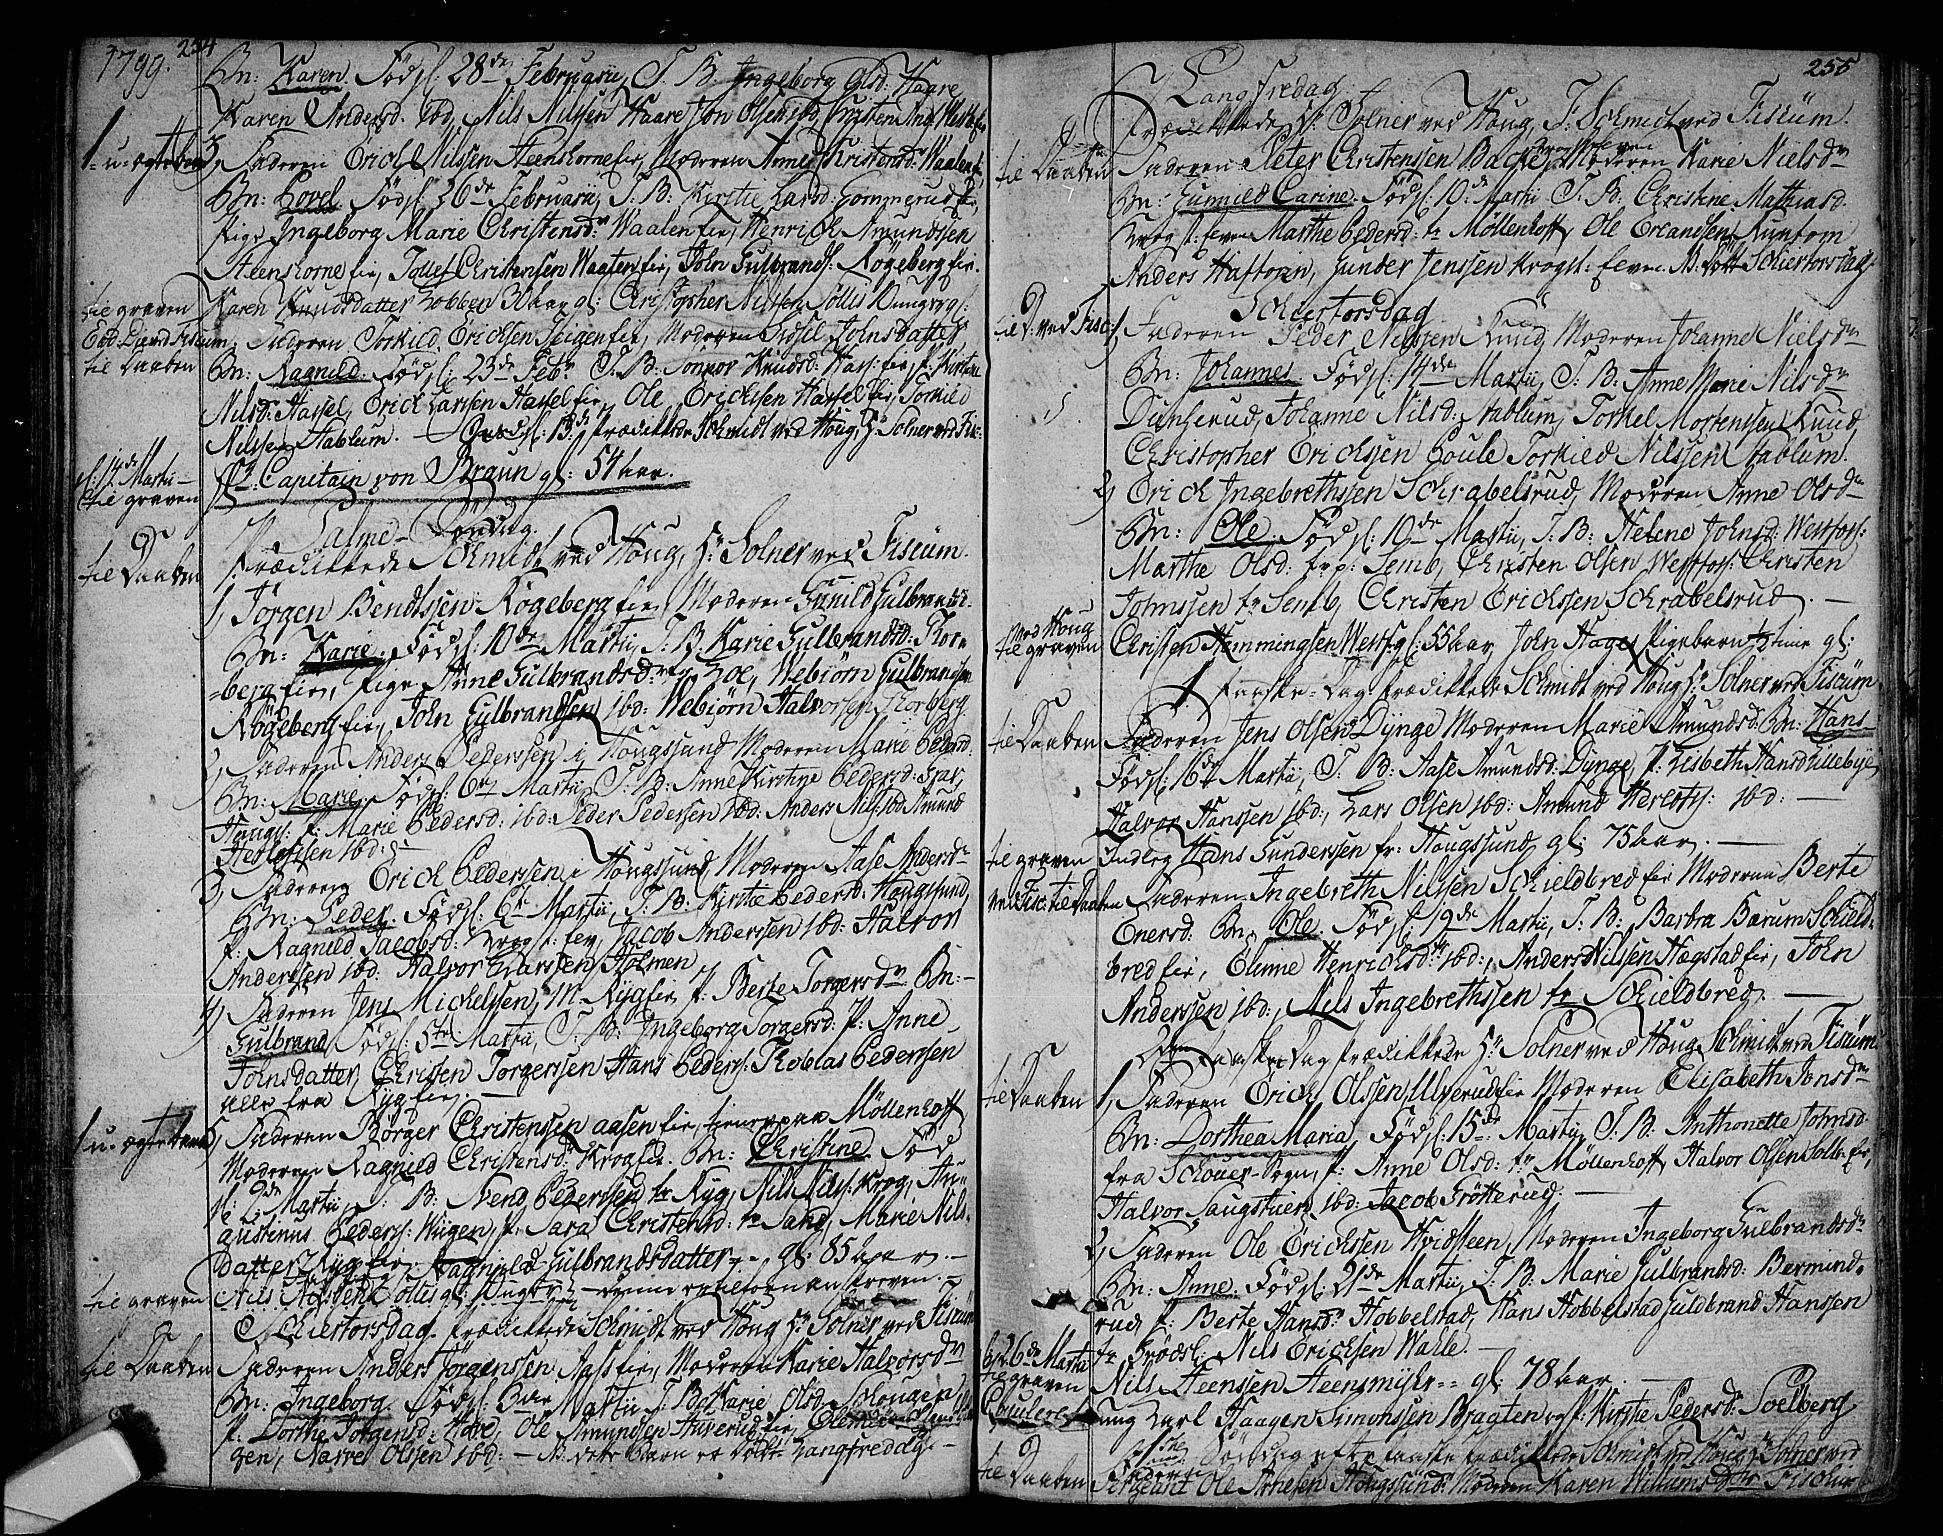 SAKO, Eiker kirkebøker, F/Fa/L0009: Ministerialbok nr. I 9, 1789-1806, s. 254-255